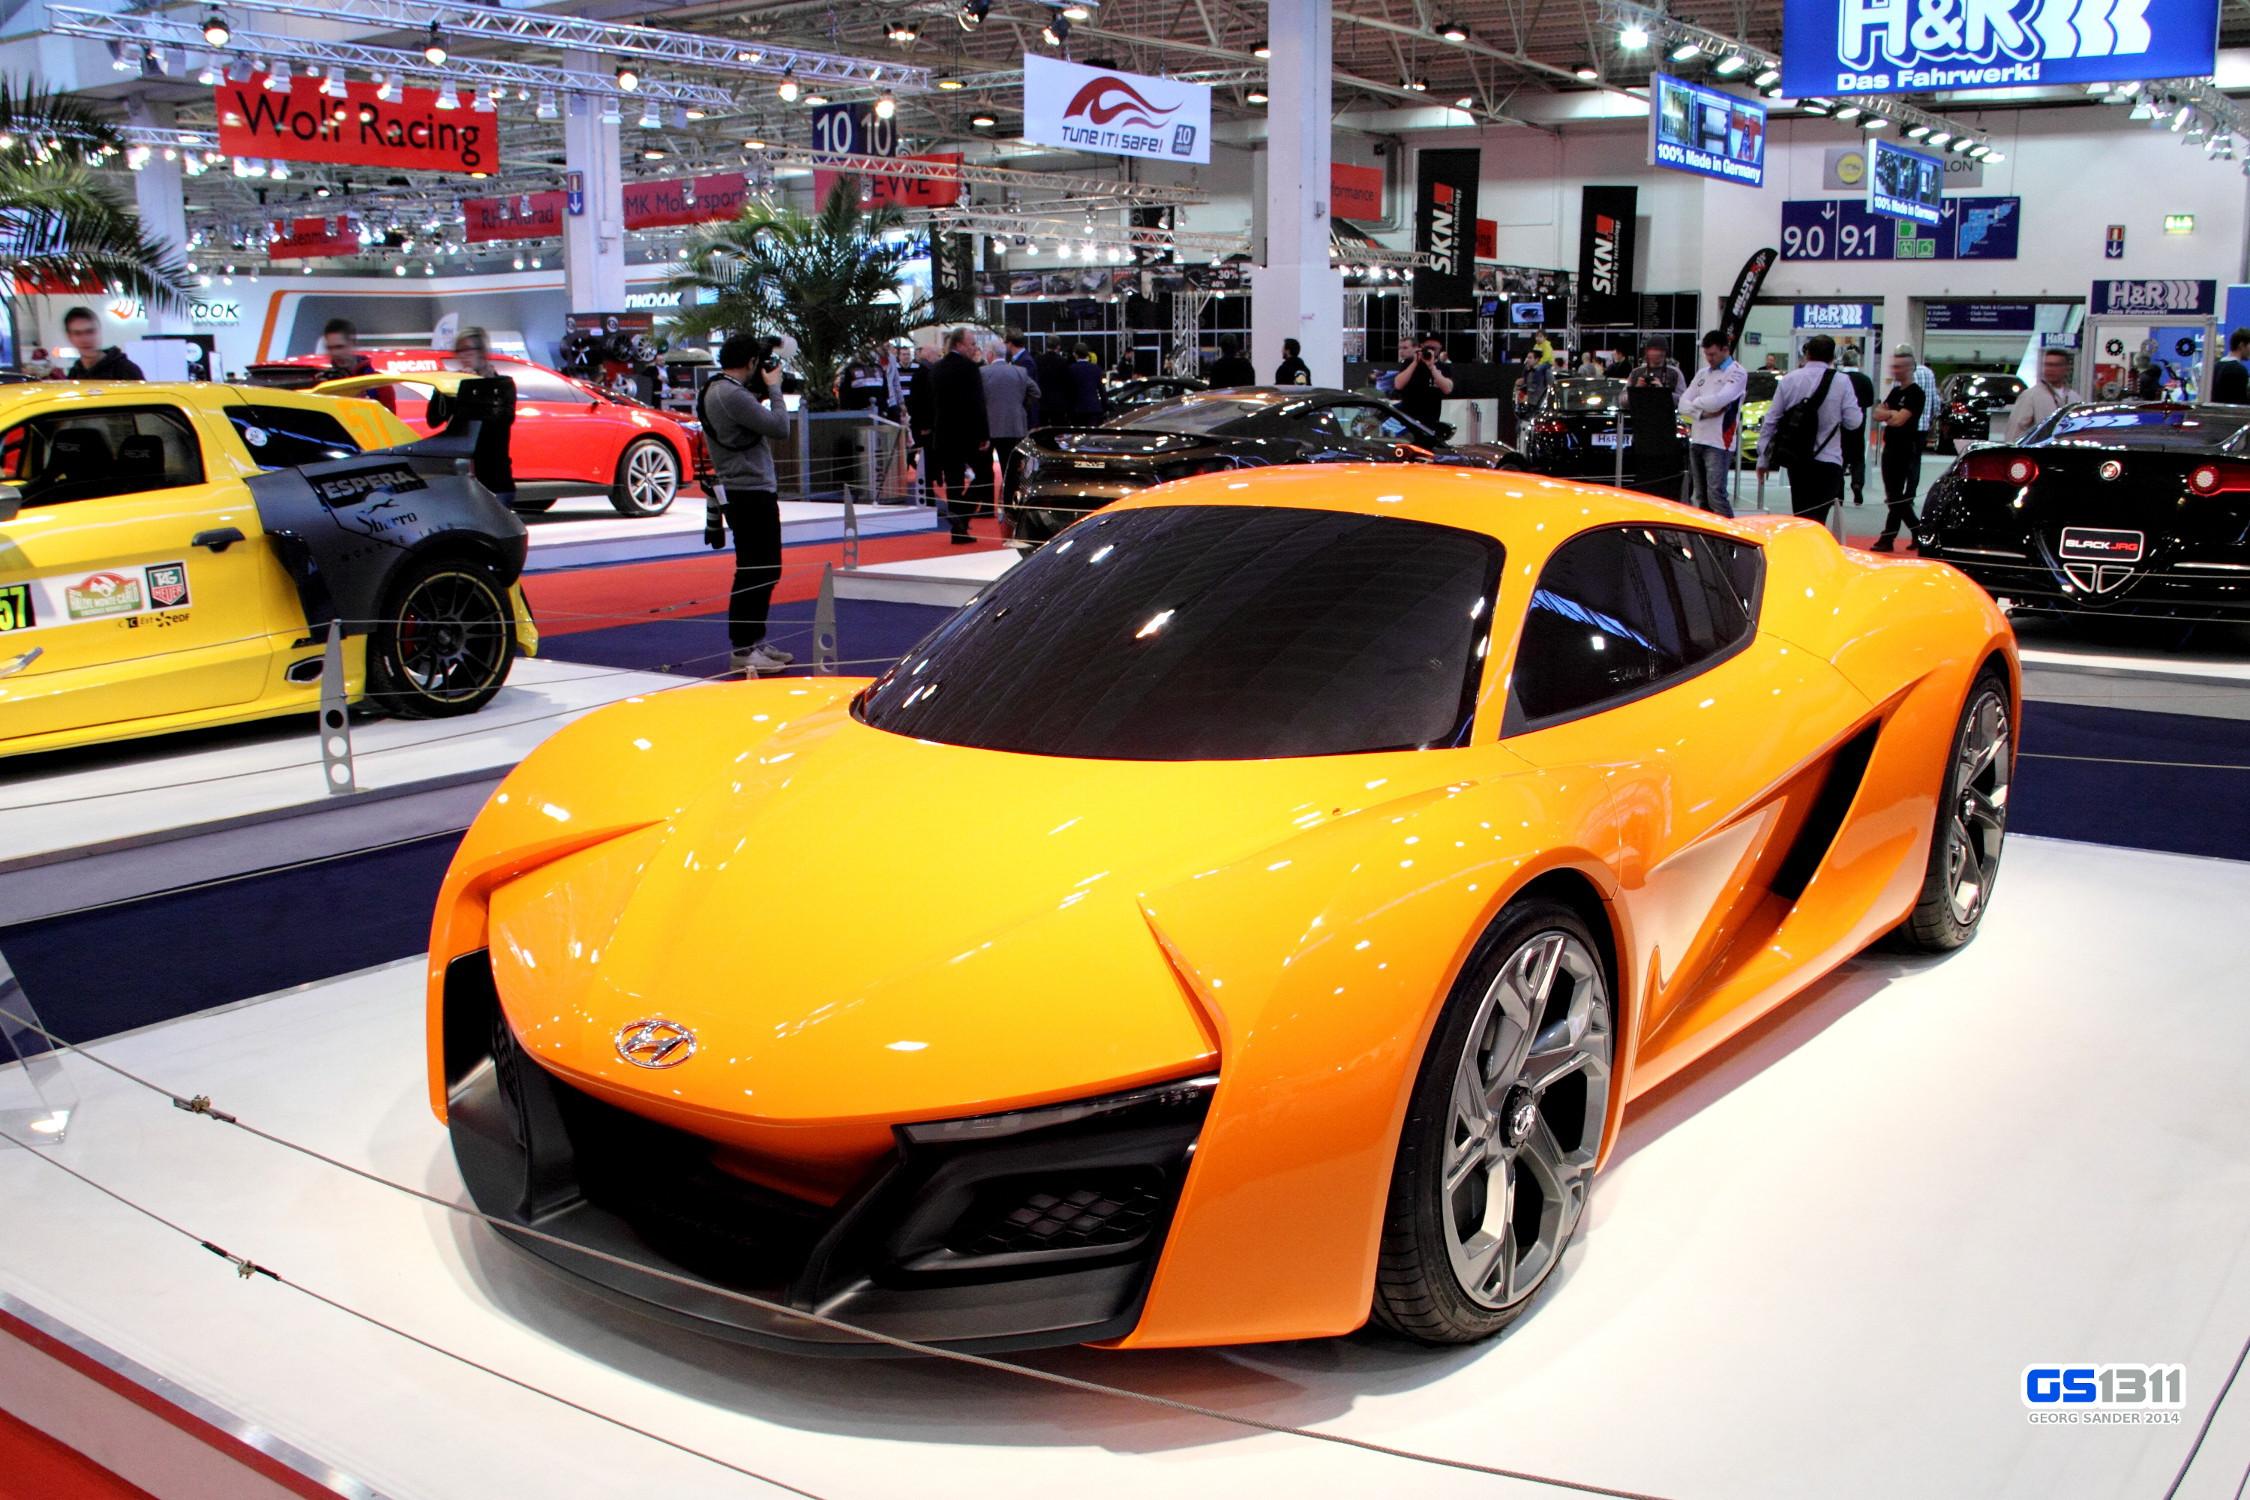 Hintergrundbilder : Auto, Fahrzeug, Lamborghini Aventador, Orange ...